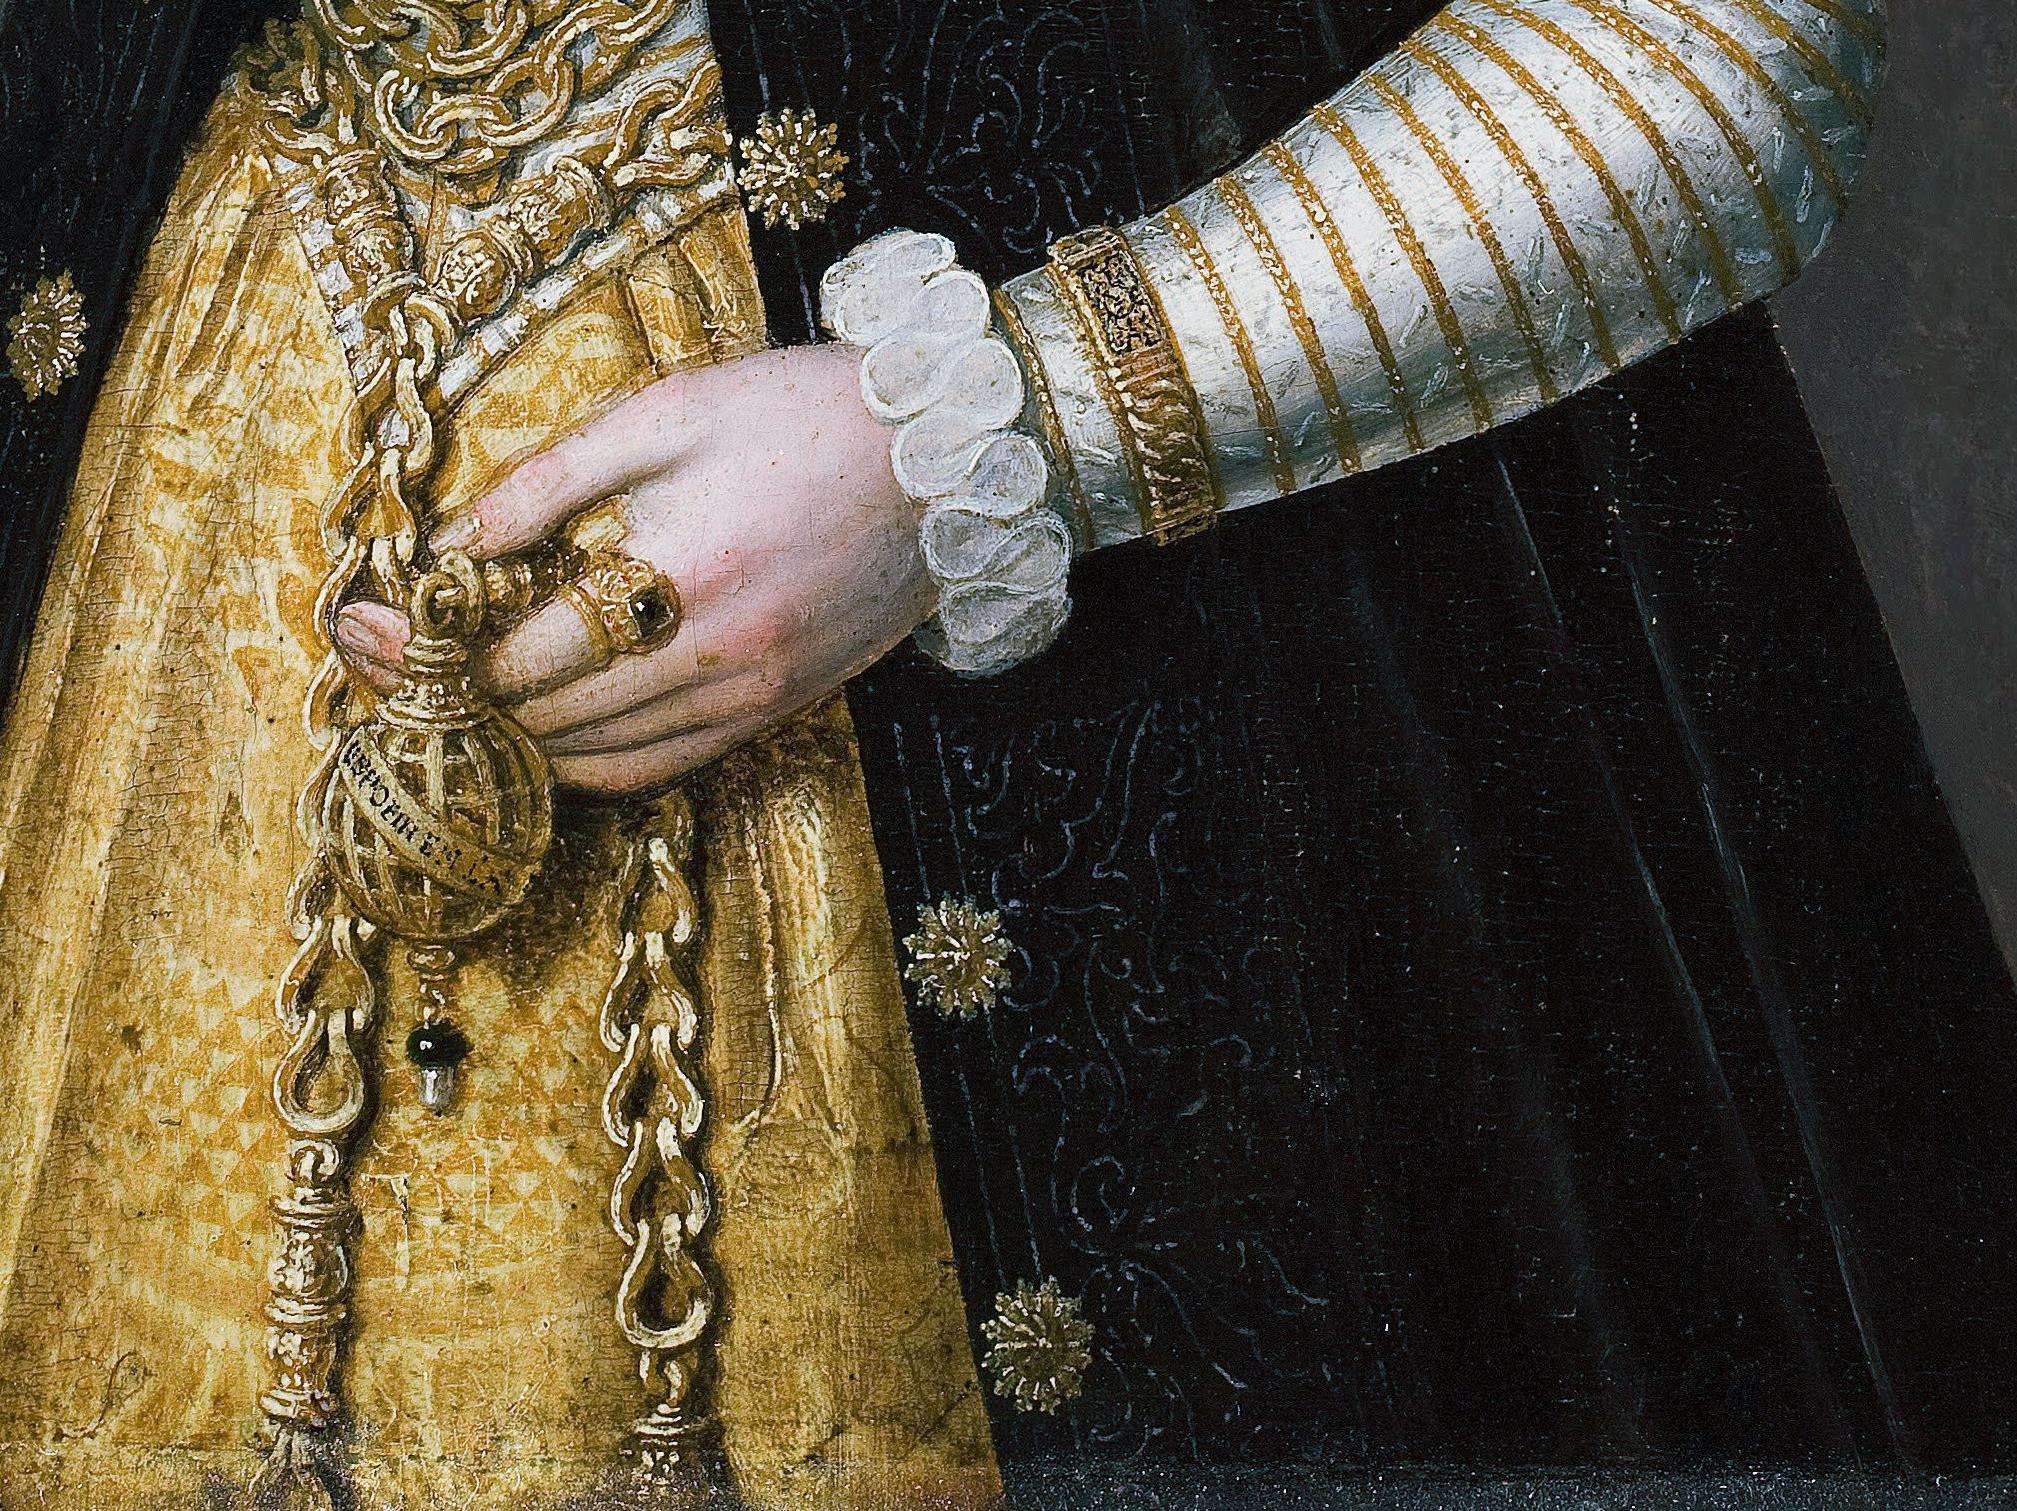 Aromatic Jewelry